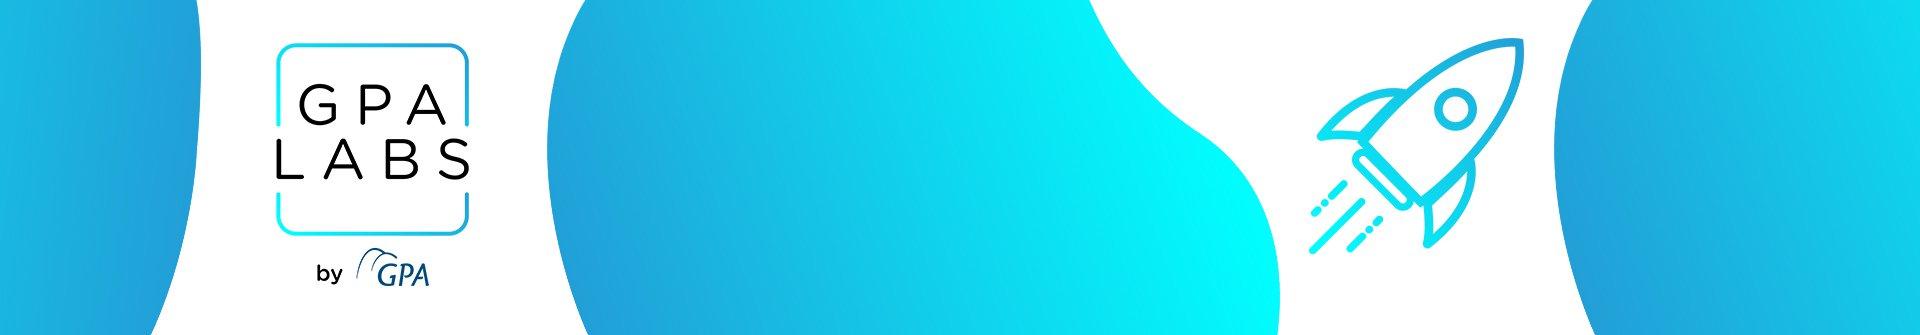 17943, , banner_principal-gpalabs, , , image/jpeg, https://www.gpabr.com/wp-content/uploads/2020/01/banner_principal-gpalabs.jpg, 1920, 335, Array